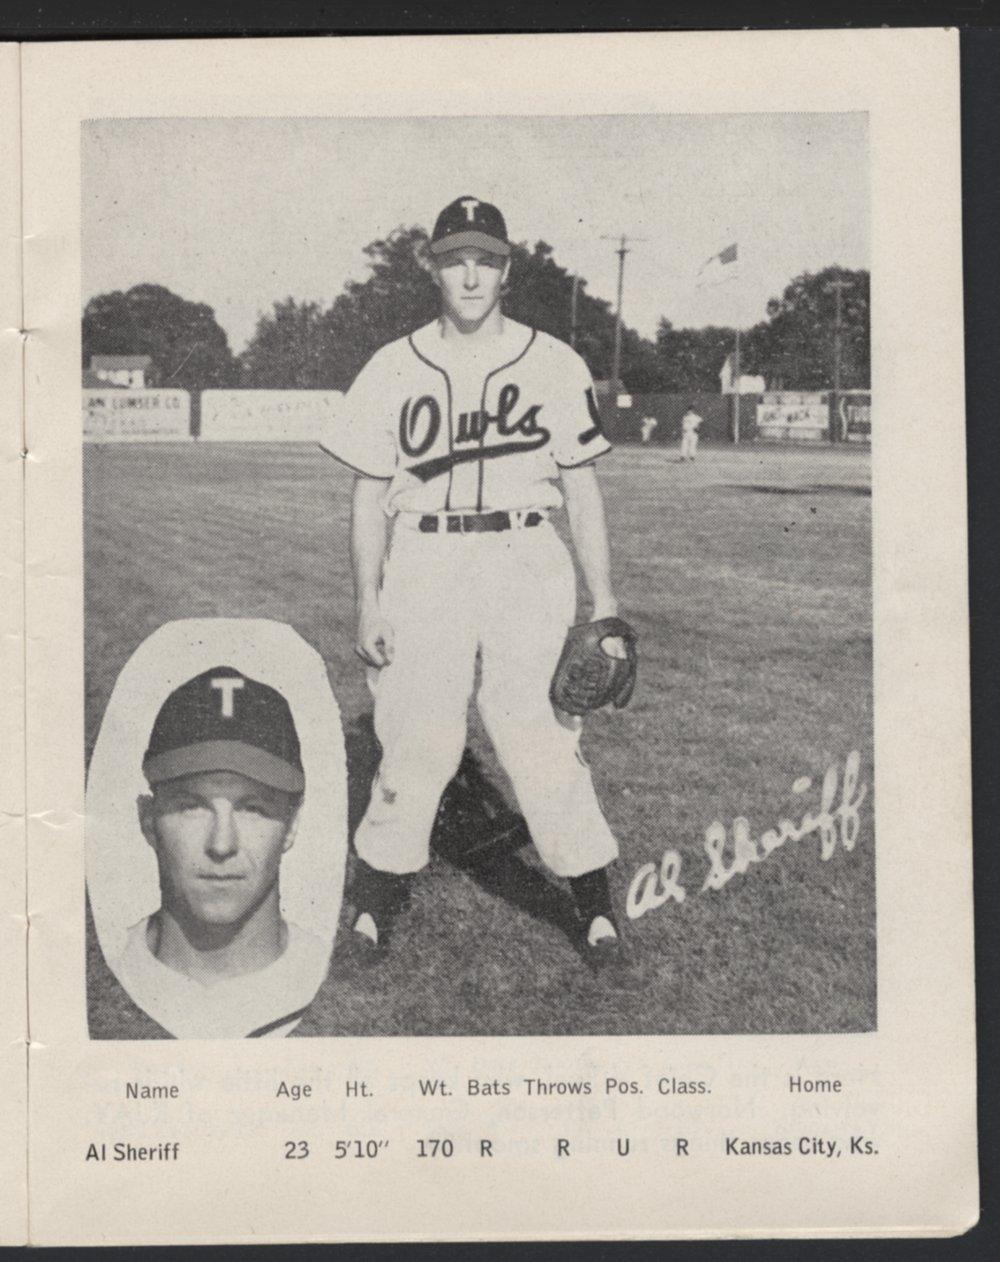 Meet your baseball players on KJAY - 5